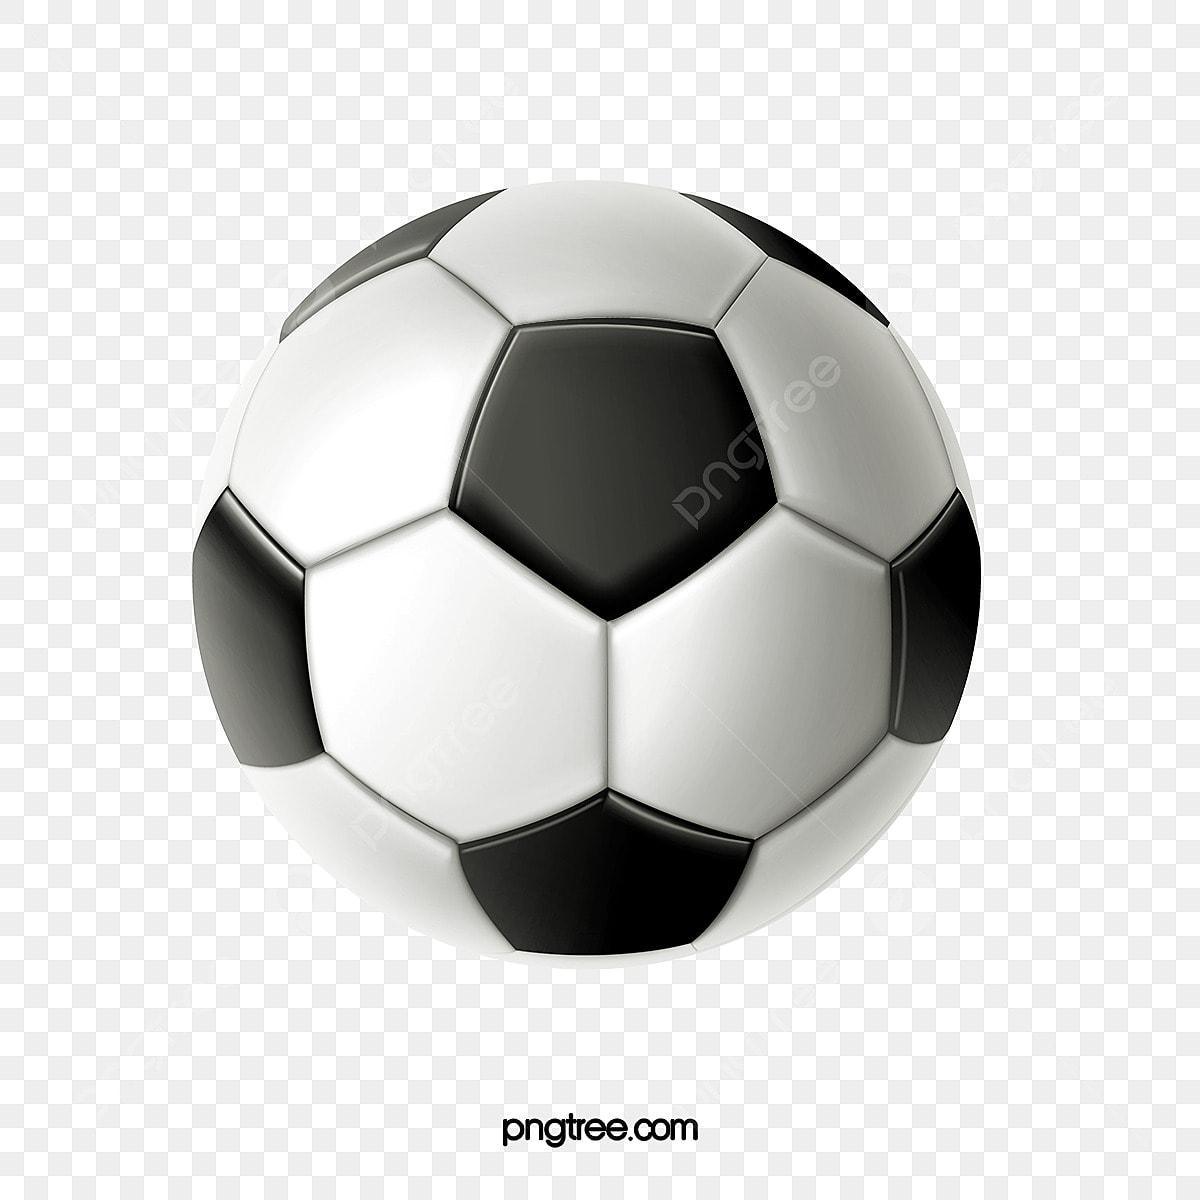 Un Ballon De Foot, Clipart Football, Football, Une Fichier PNG et ...